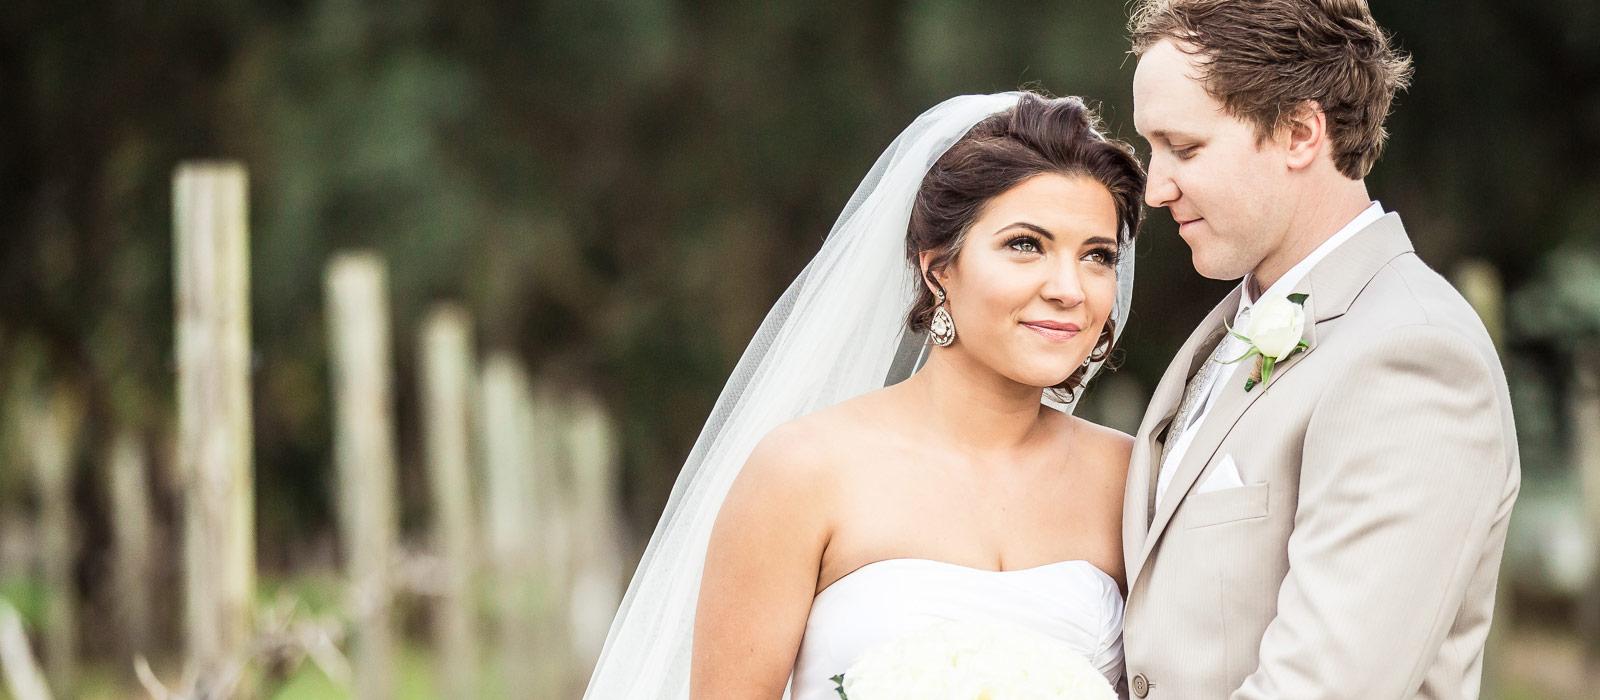 Bride and groom portrait by Gold Coast wedding photographer Chris Harding